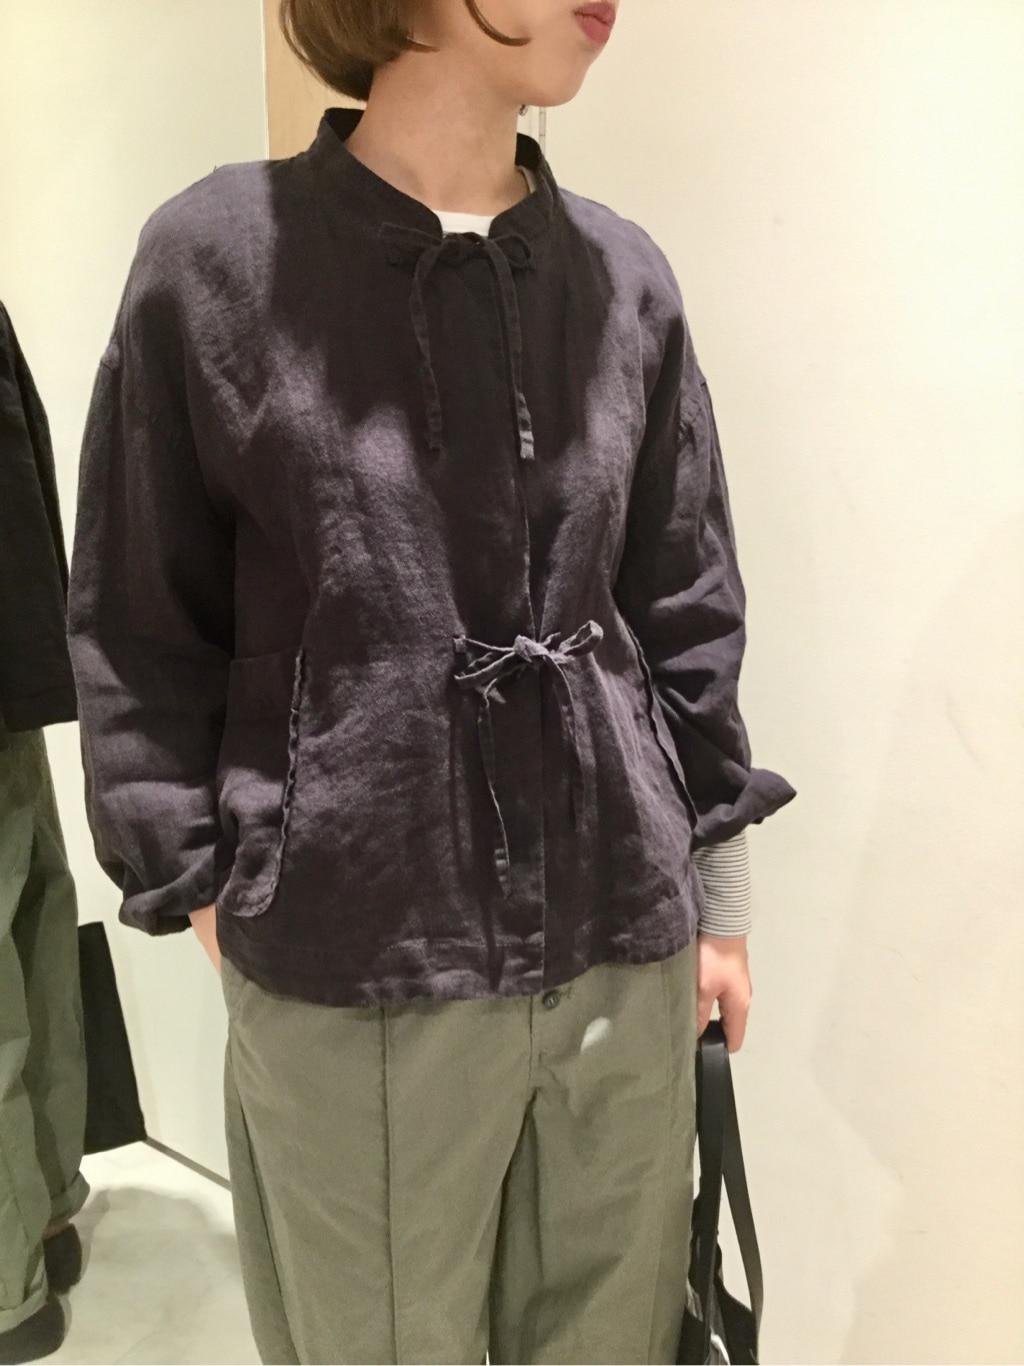 bulle de savon トリエ京王調布 身長:157cm 2020.04.08